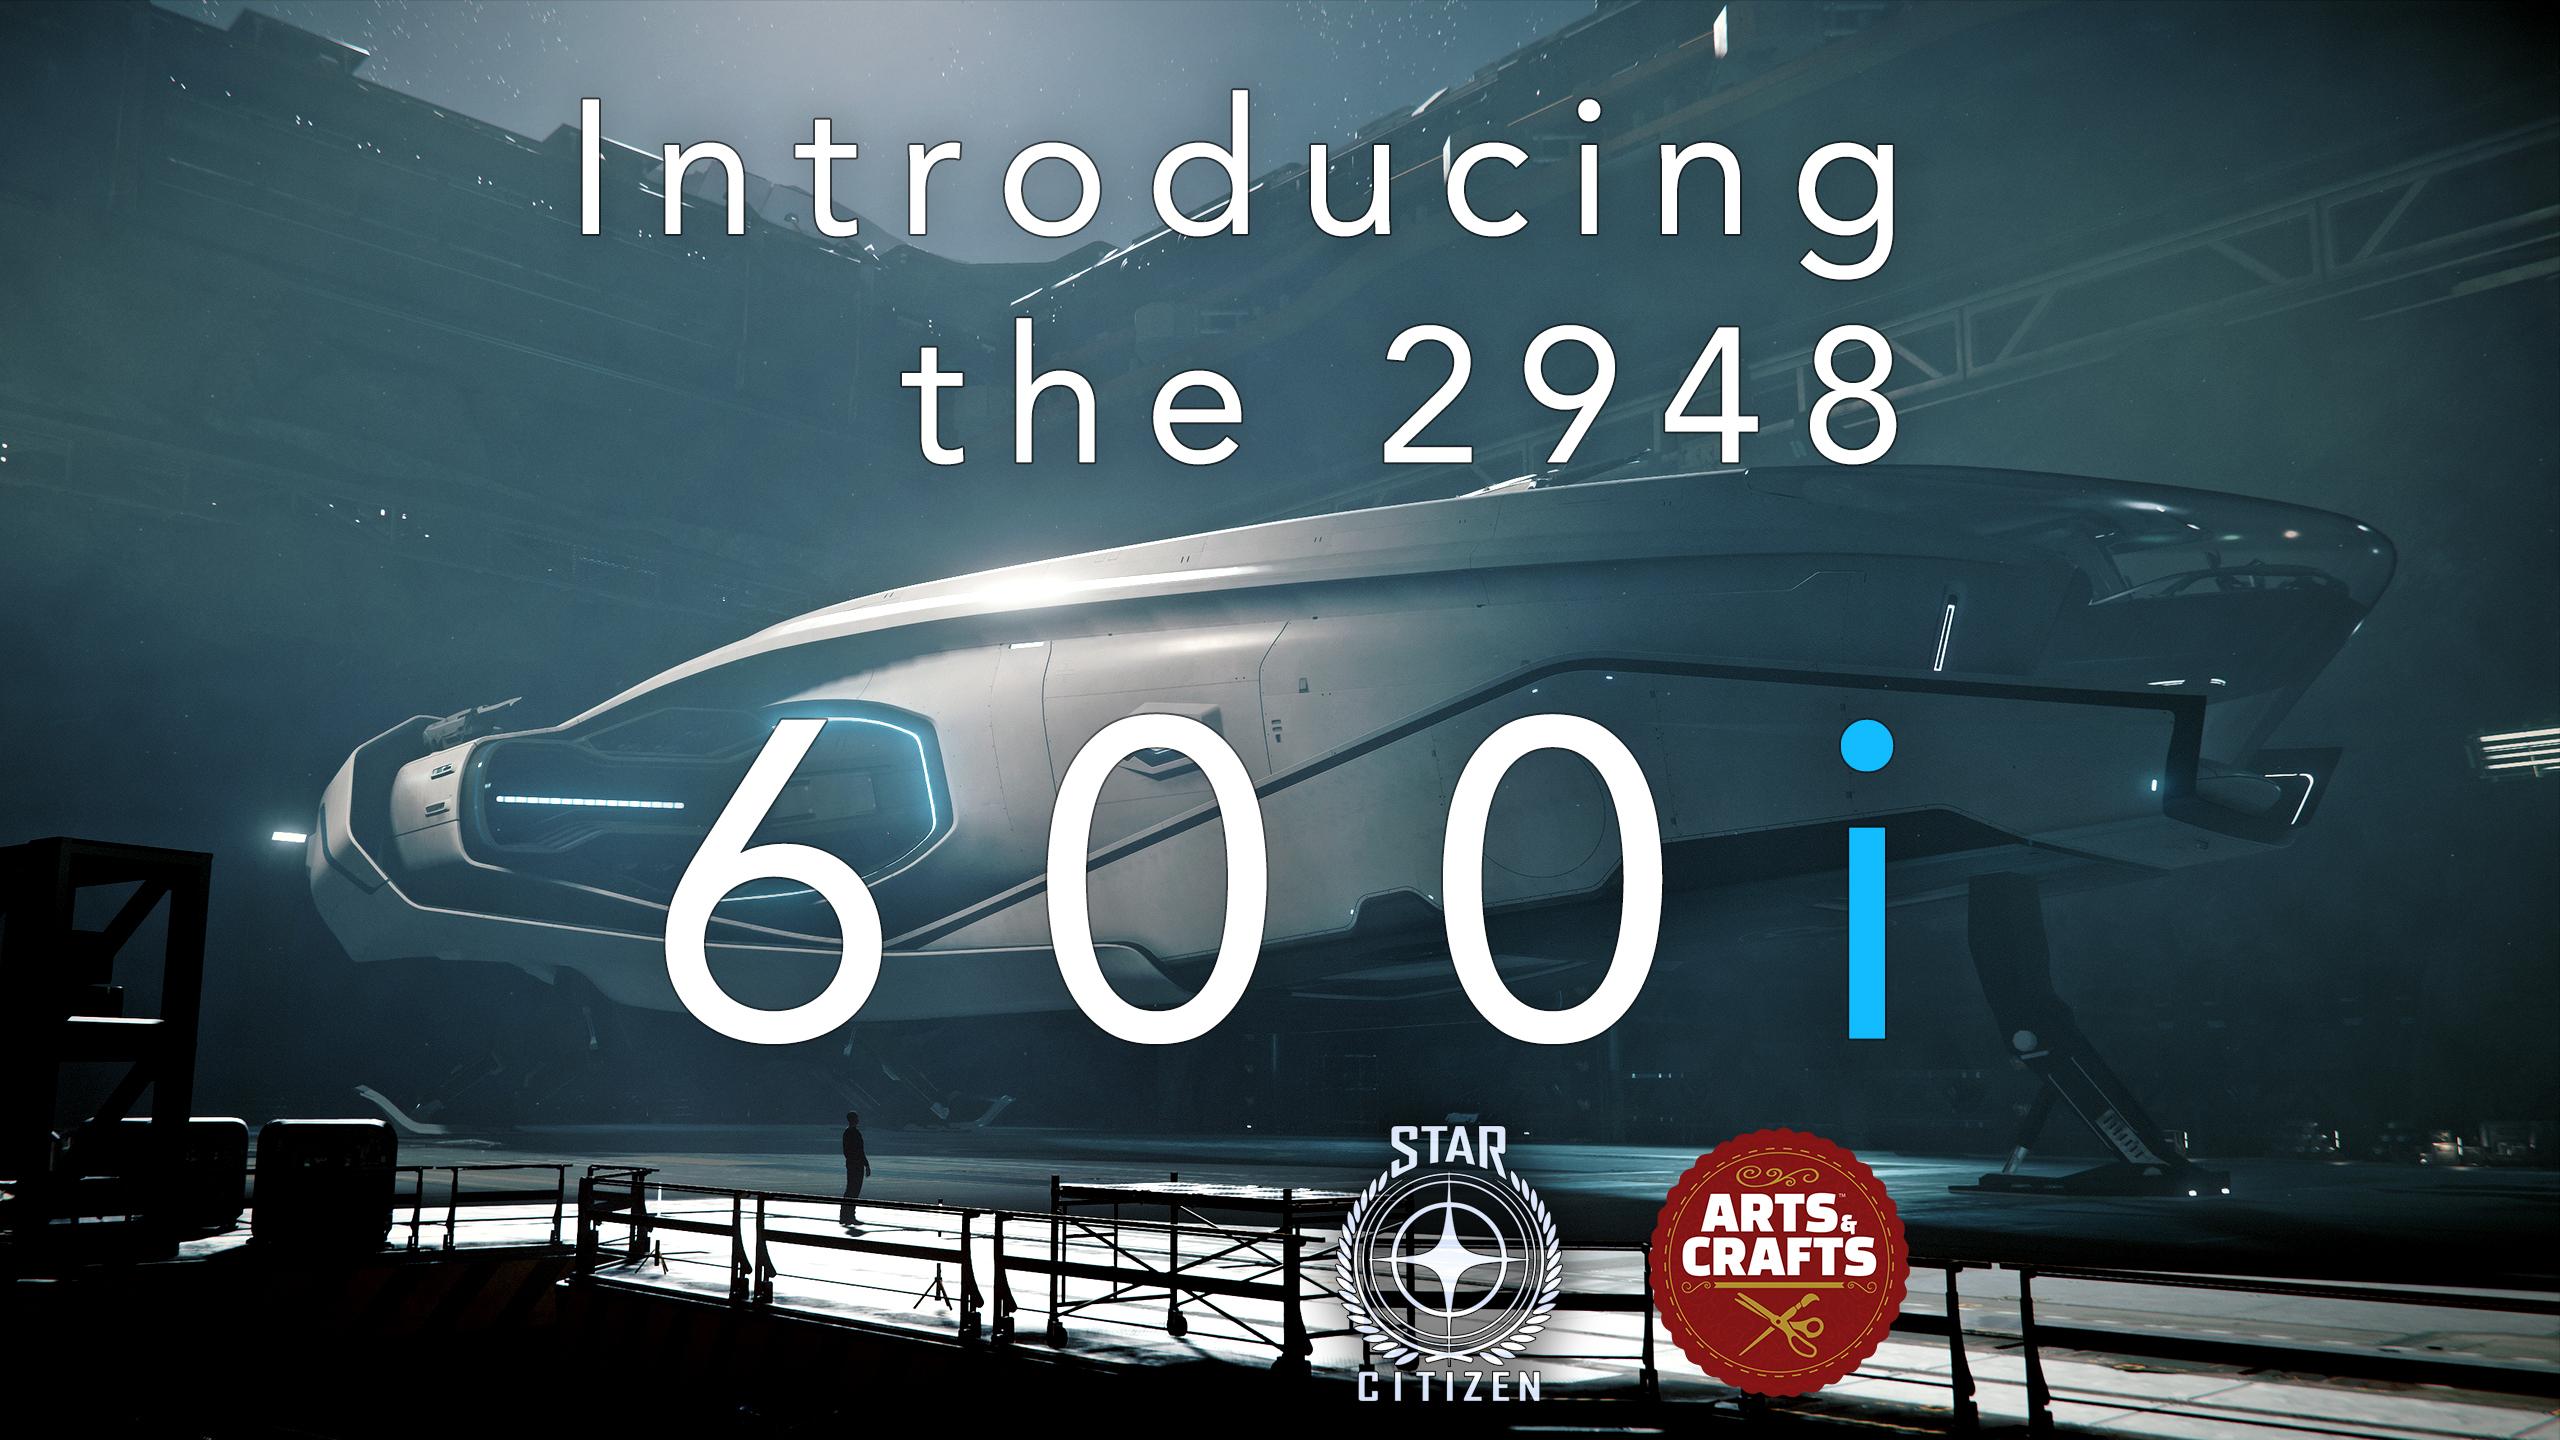 Star Citizen Origin 600i Commercial [CIG Contest]